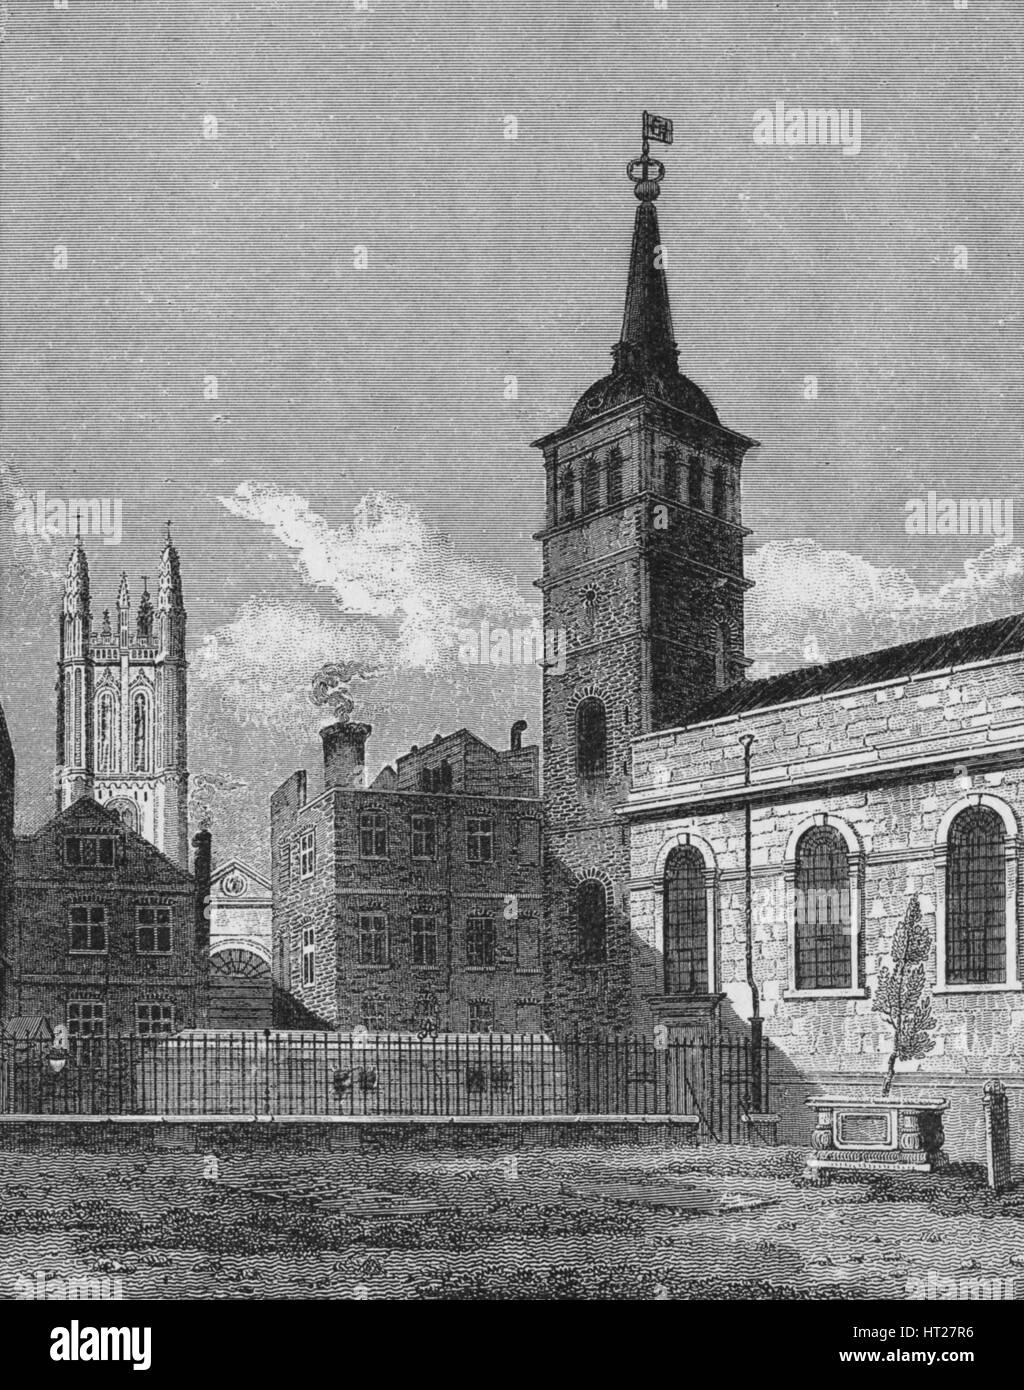 St Peter's Church, Cornhill, City of London, 1811 (1911). Artist: George Sidney Shepherd. - Stock Image